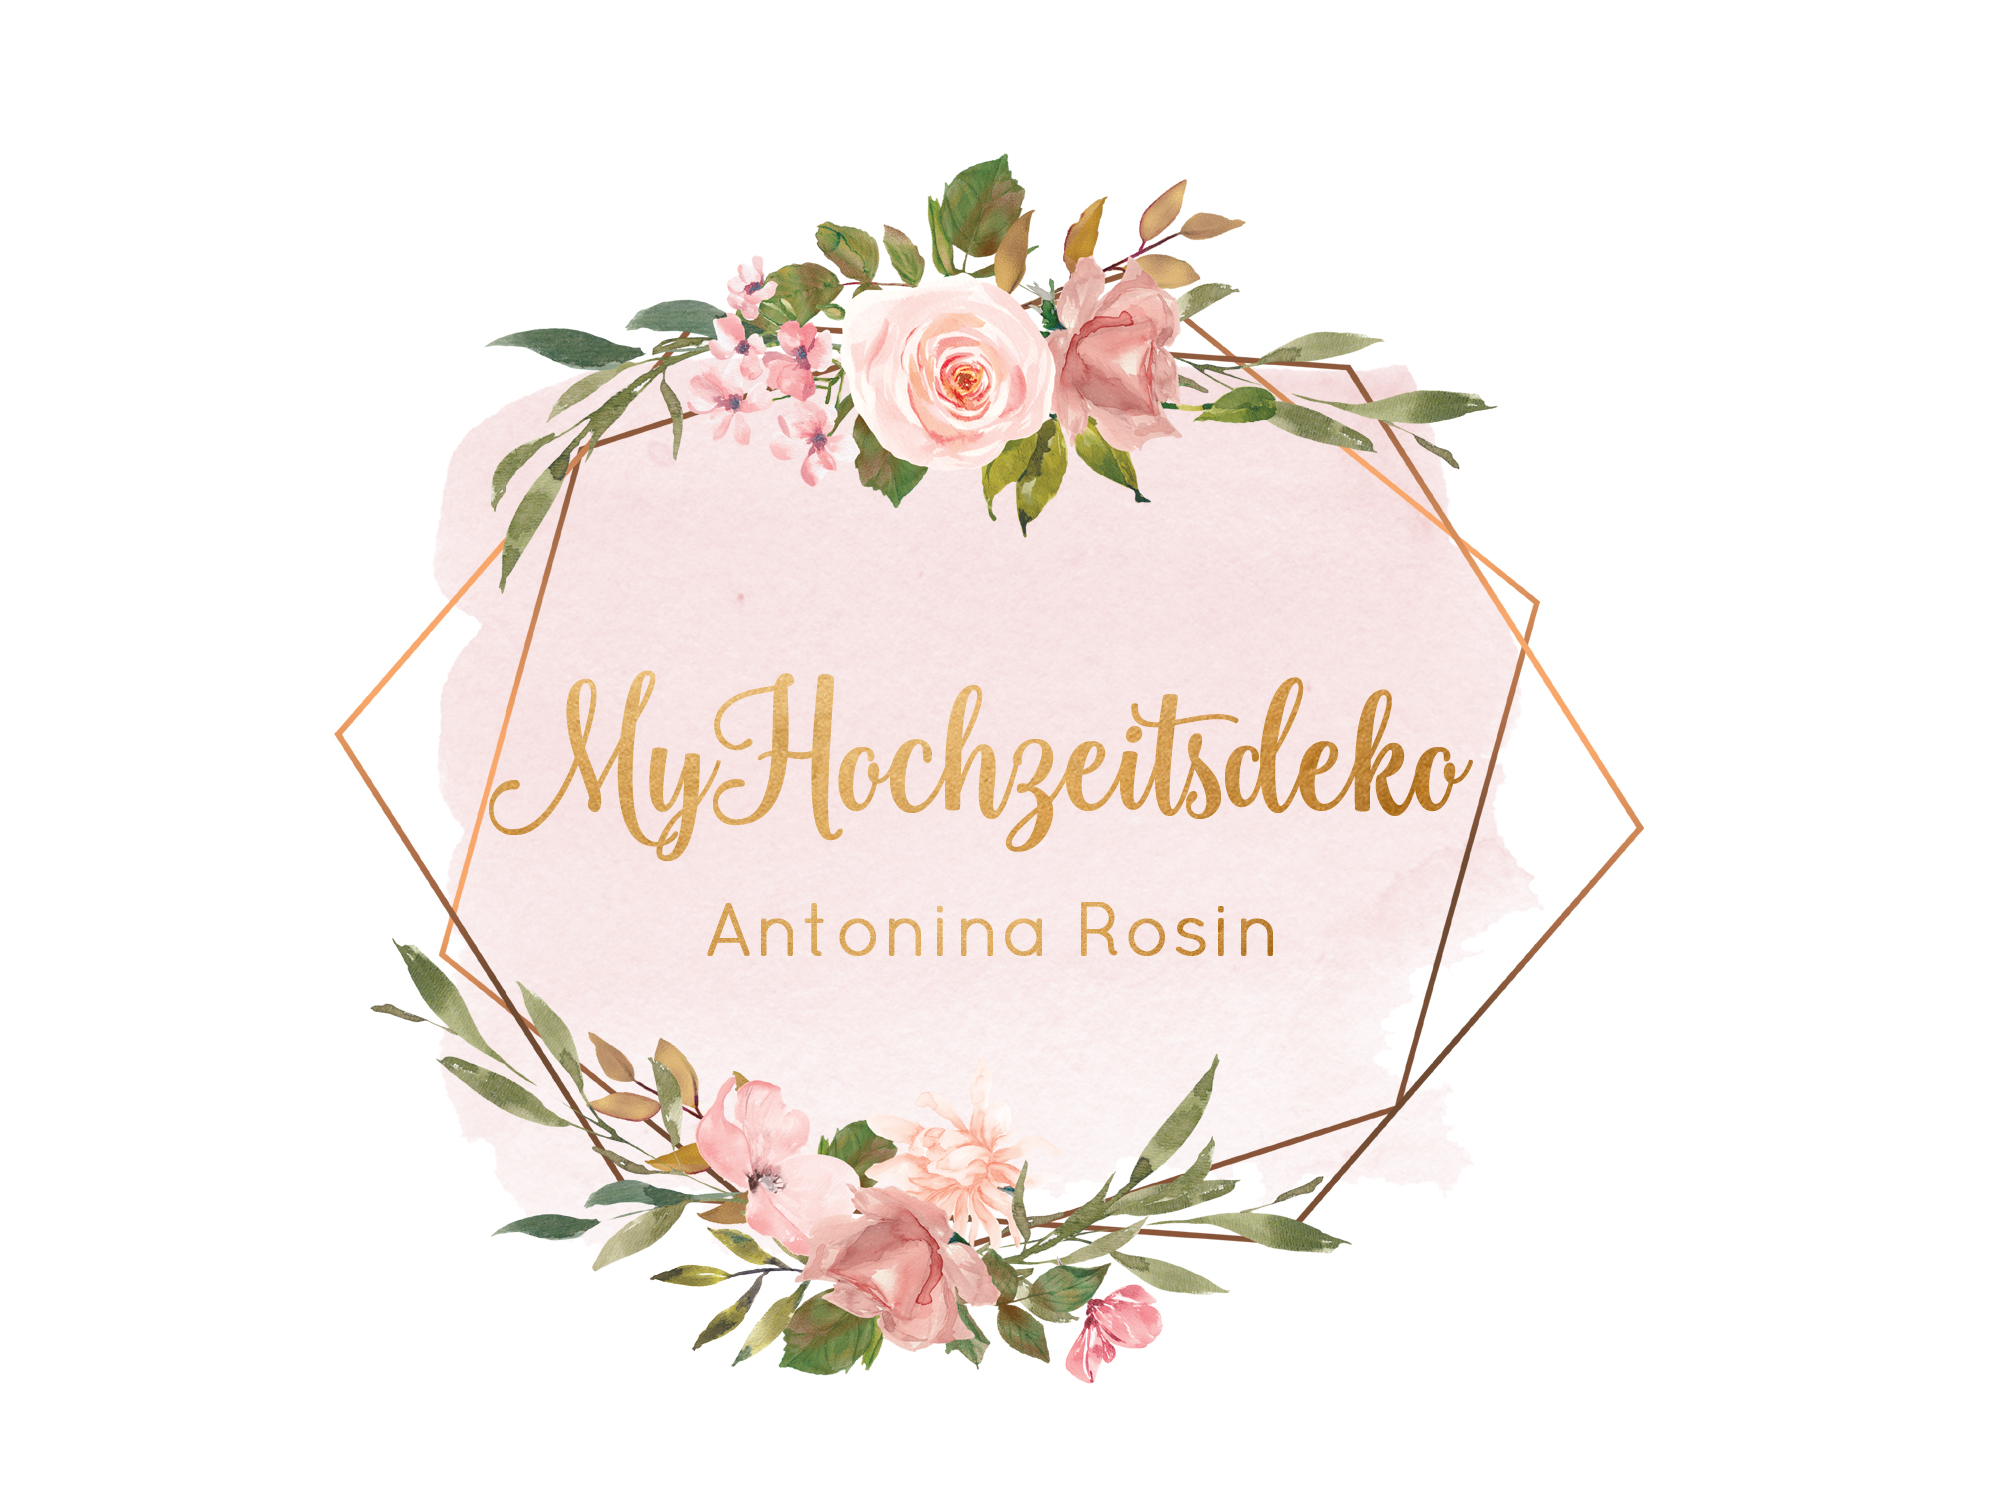 MyHochzeitsdeko Antonina Rosin